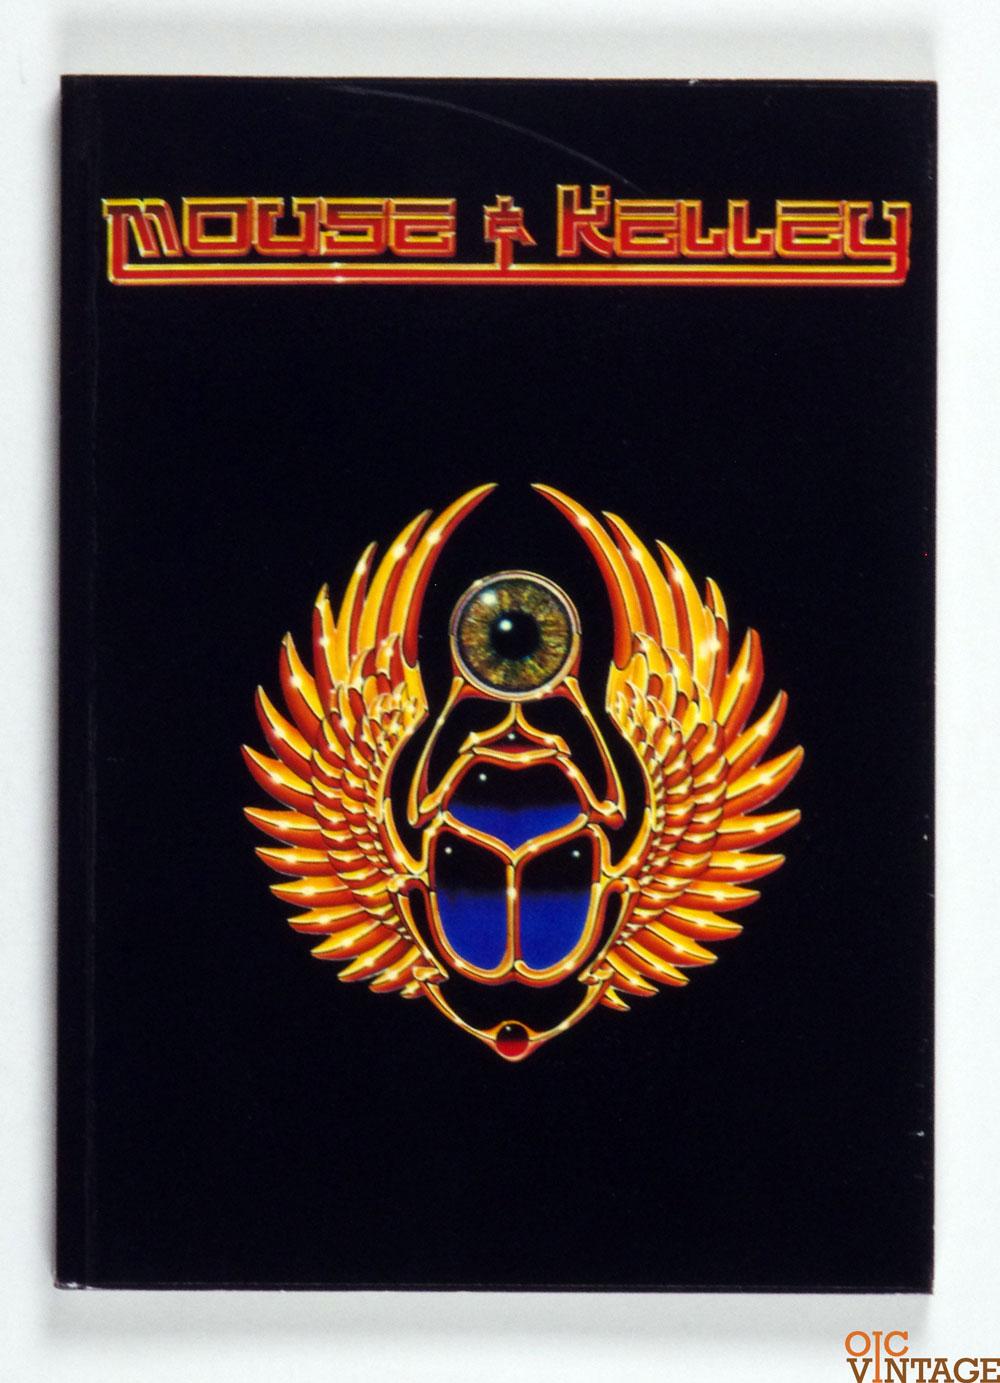 Stanley Mouse Alton Kelley Book Psychedelic Art book 1979 Nov 1st Edition